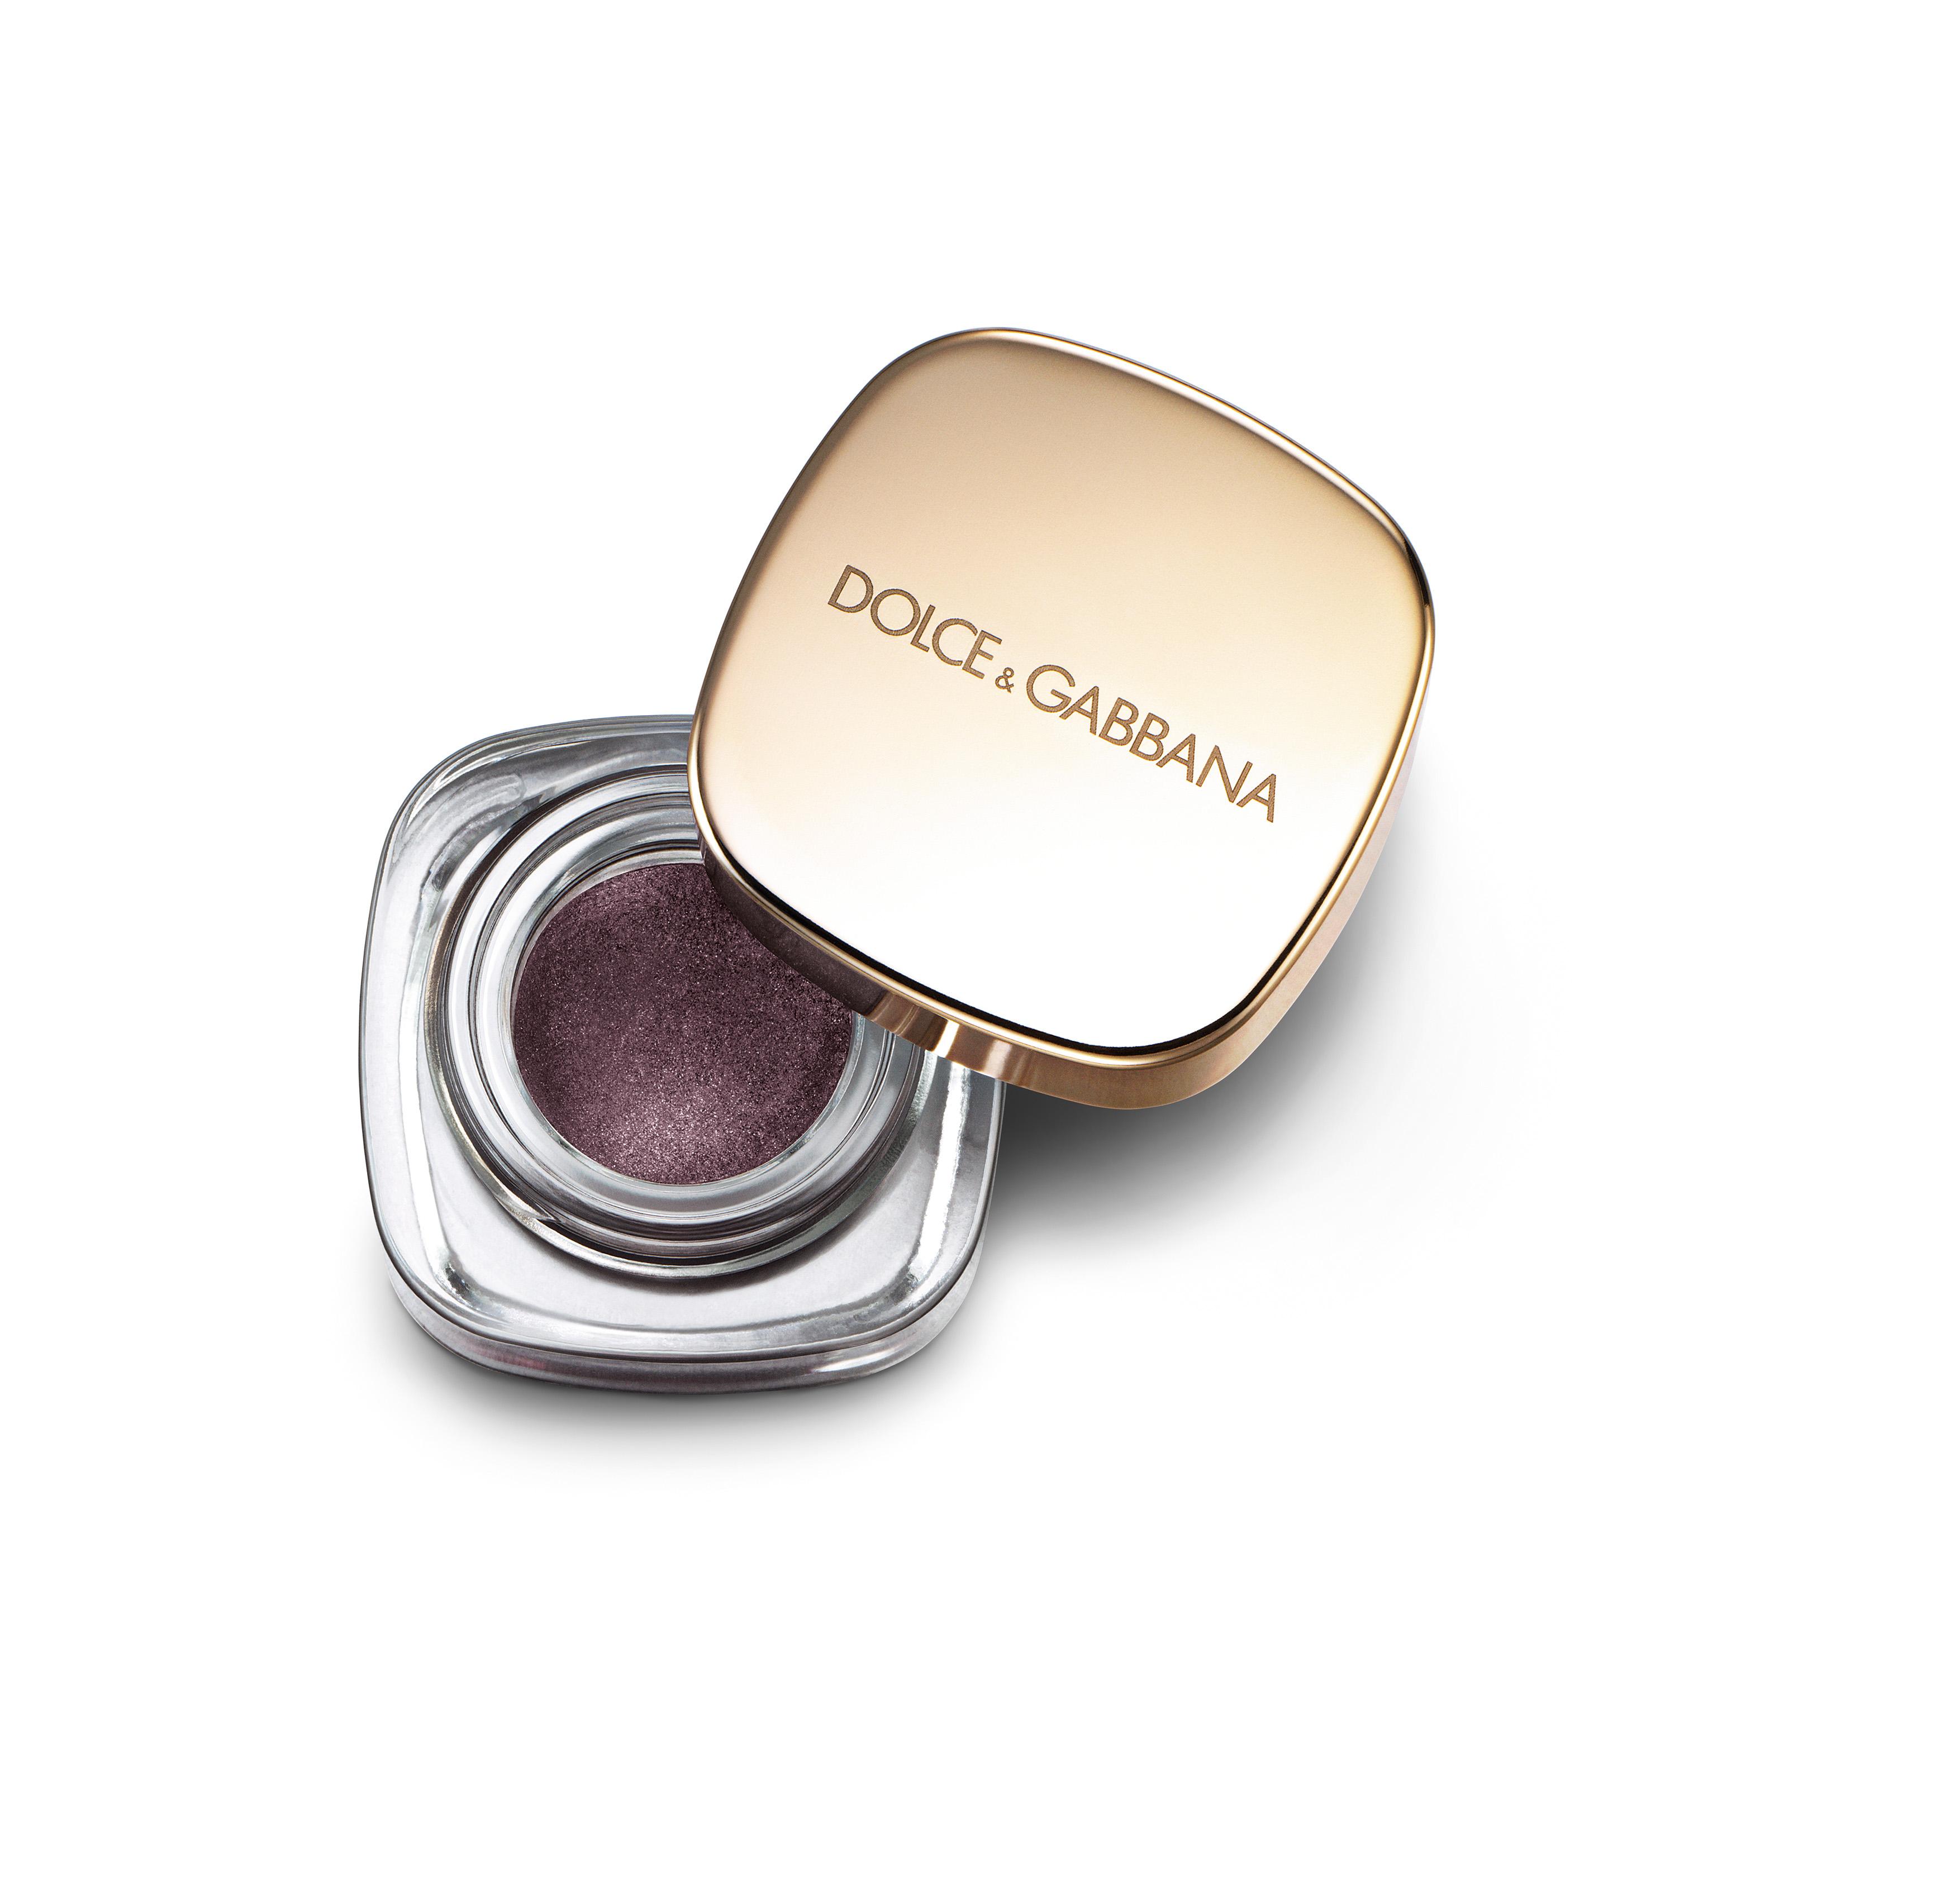 Dolce & Gabbana Perfect Mono Dahlia 100